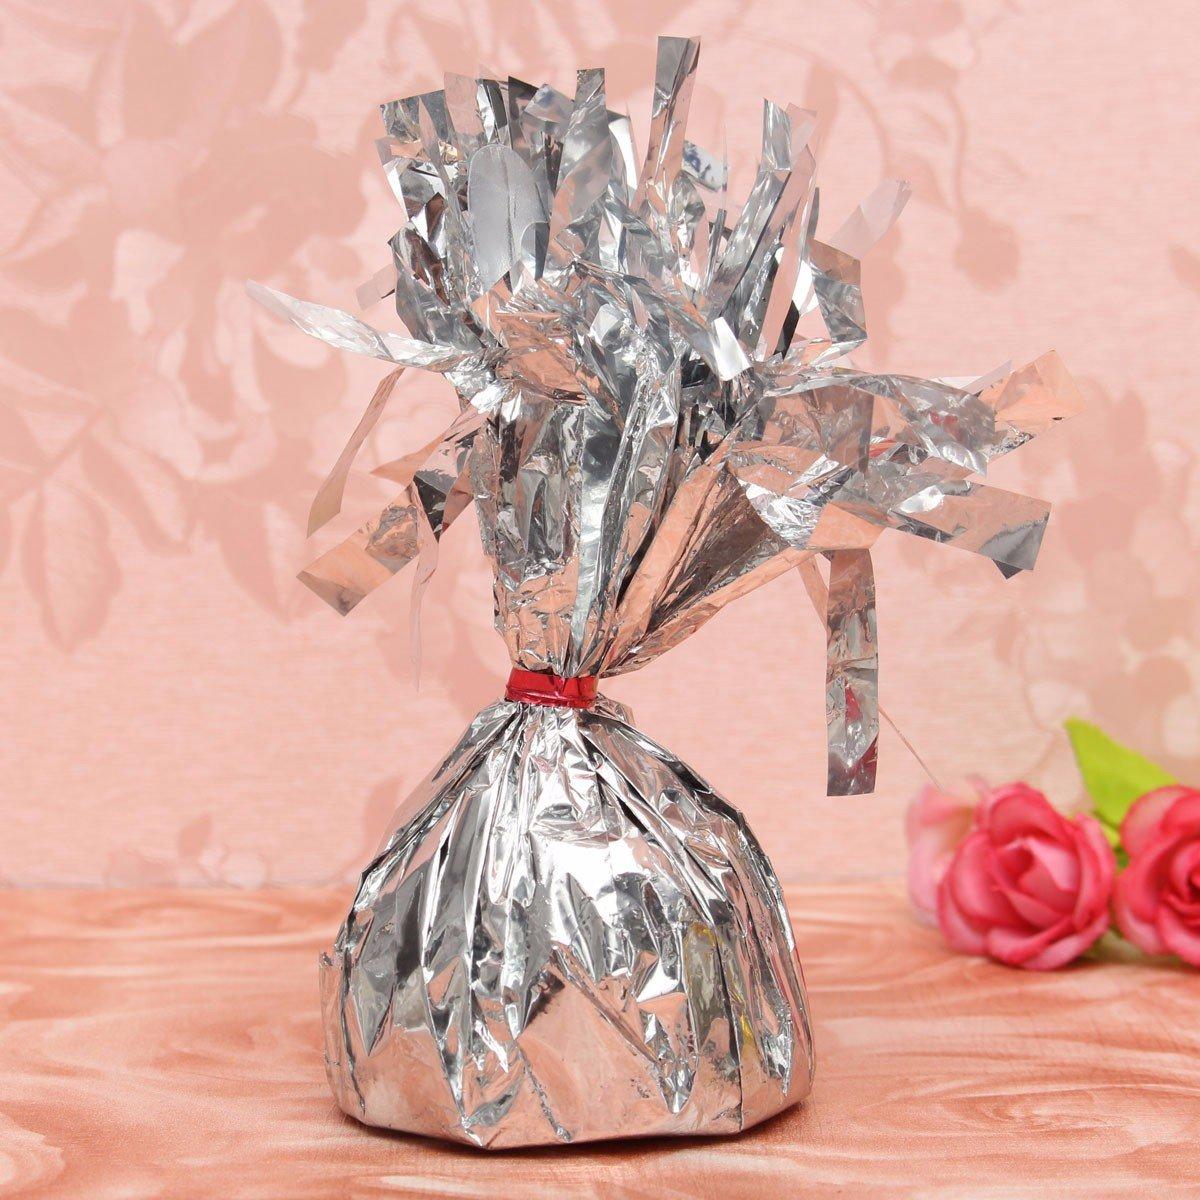 Amazon.com : Helium Balloon Weight Birthday Wedding Party Decoration ...